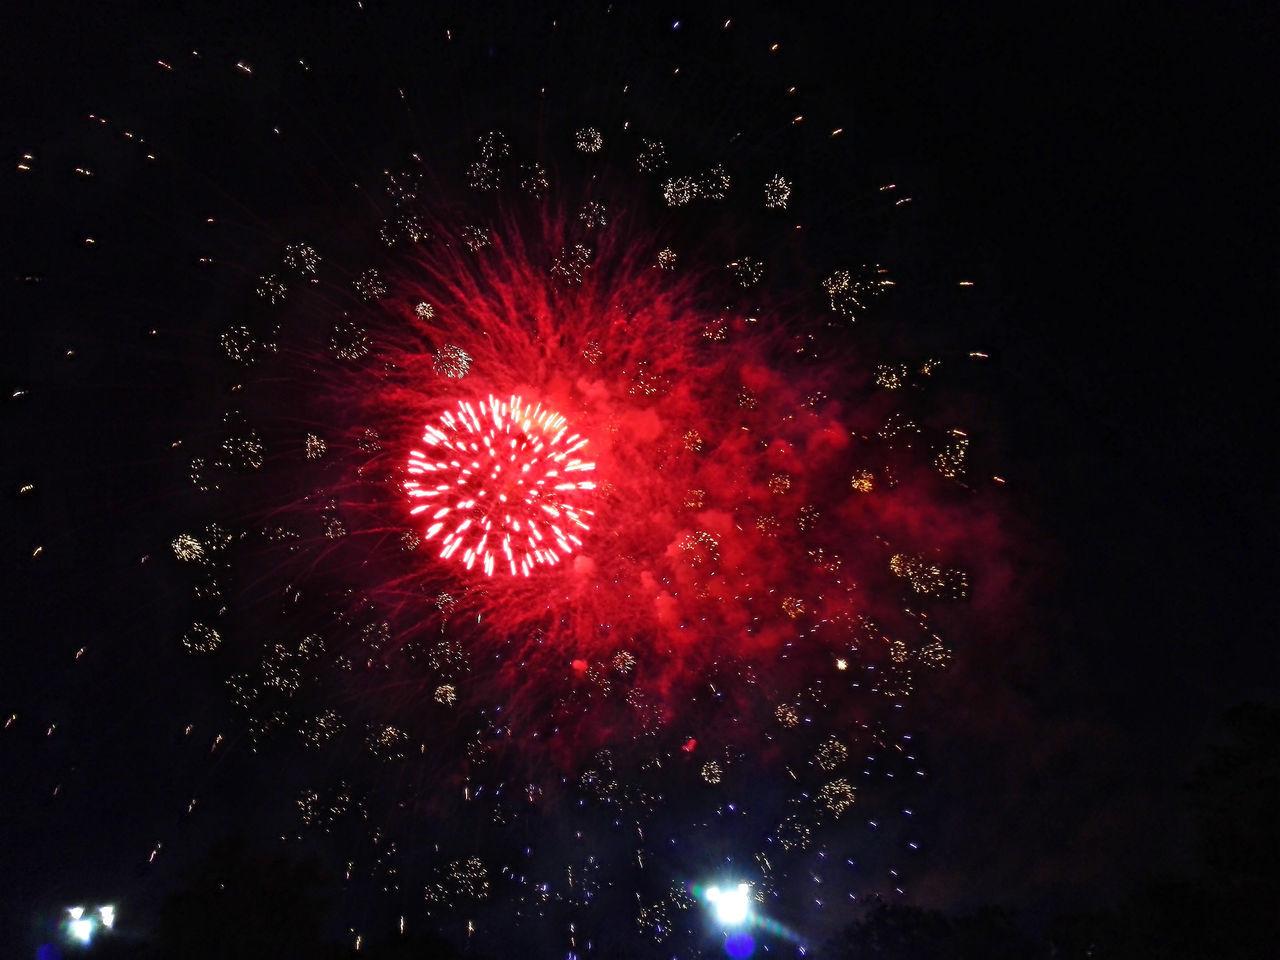 Night Red Outdoors Firework Display салют Fireworks Huawei Honor6 Huawei Honor 6 Севастополь Sevastopol  Sevastopol' Cremea Russia Event No People Celebration